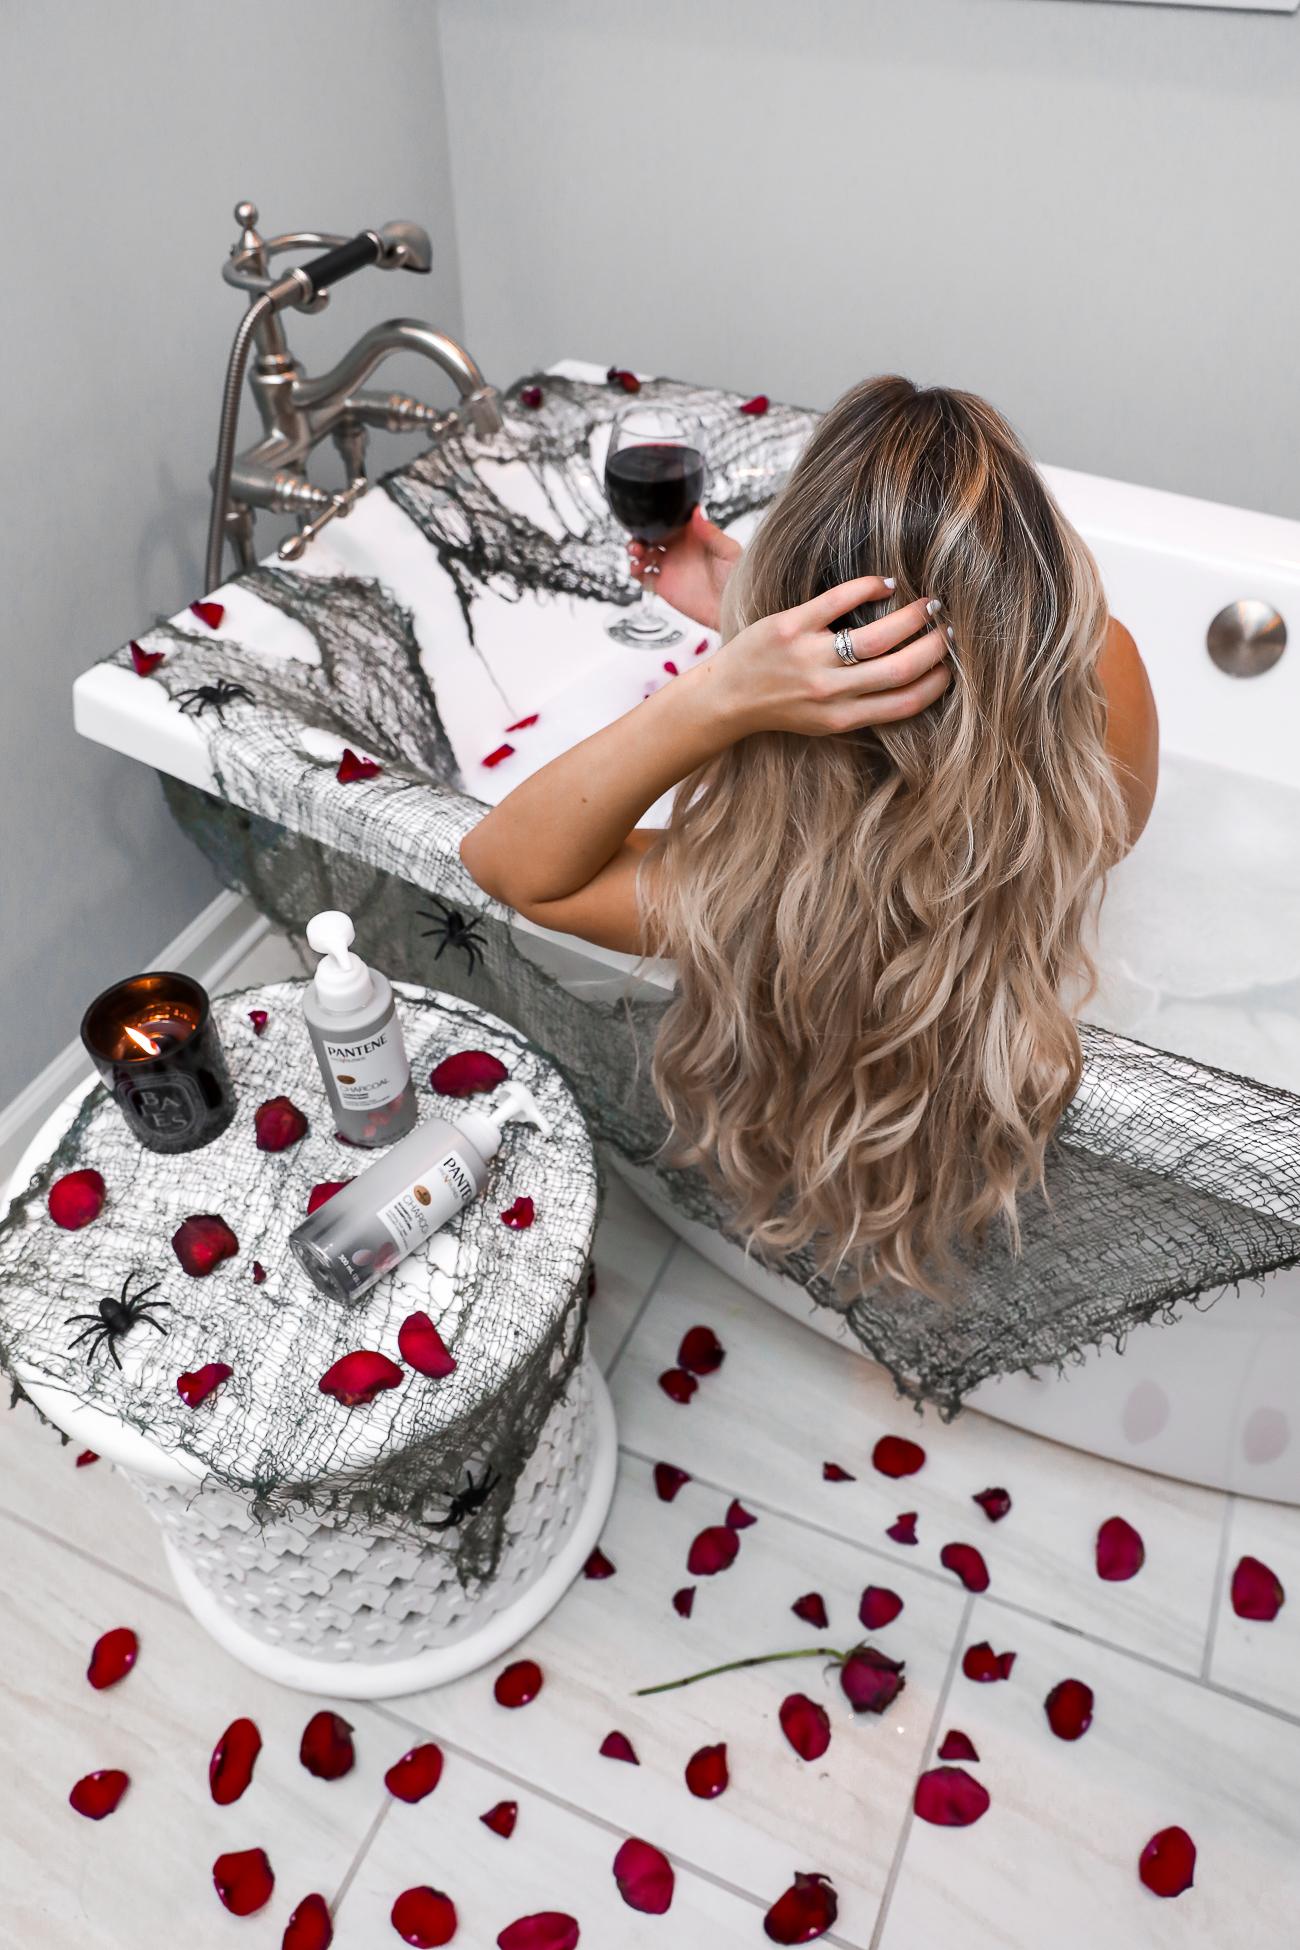 Pantene Charcoal Shampoo & Conditioner Bathtub Picture-9